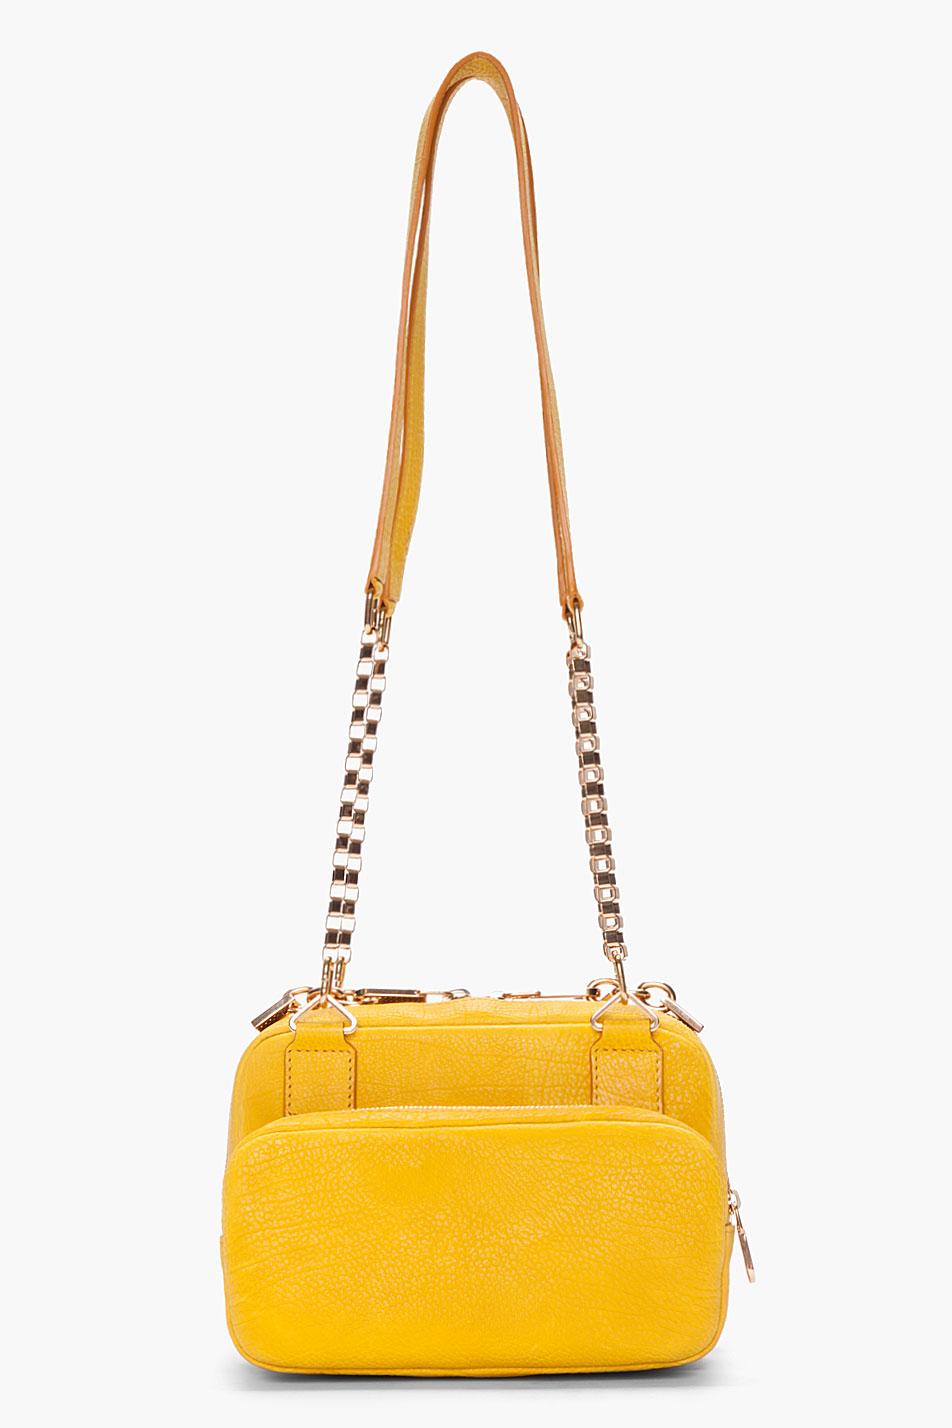 Chlo¨¦ Yellow Venetian Chain Lucy Bag in Yellow | Lyst